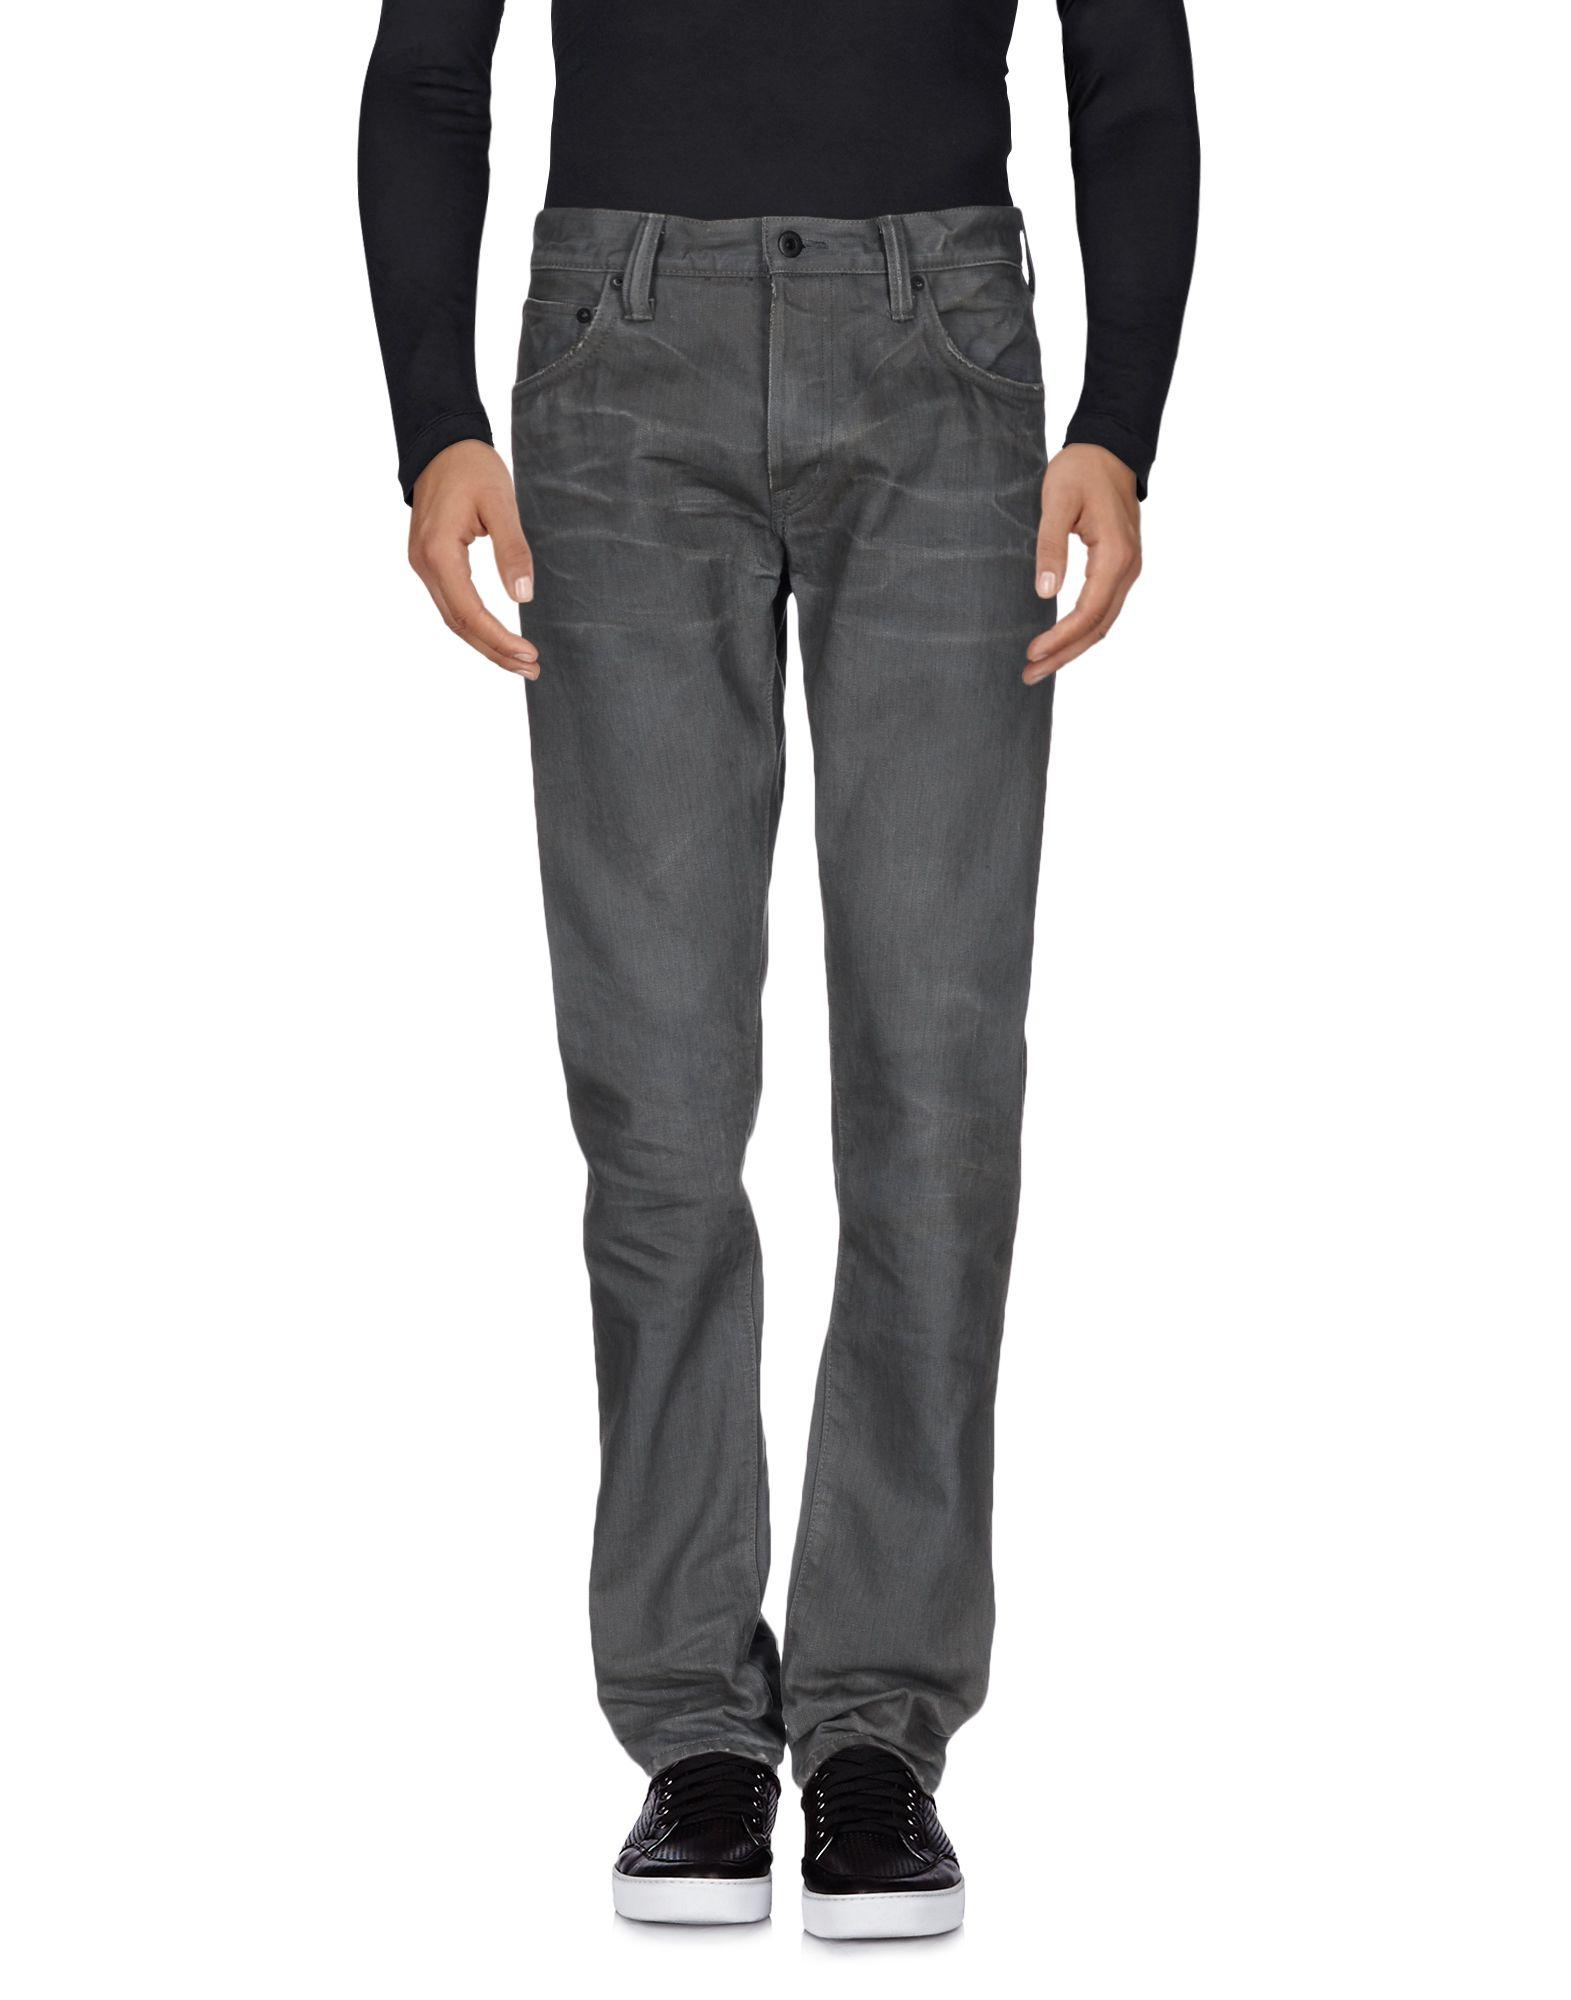 MASTERCRAFT UNION Jeans in Lead